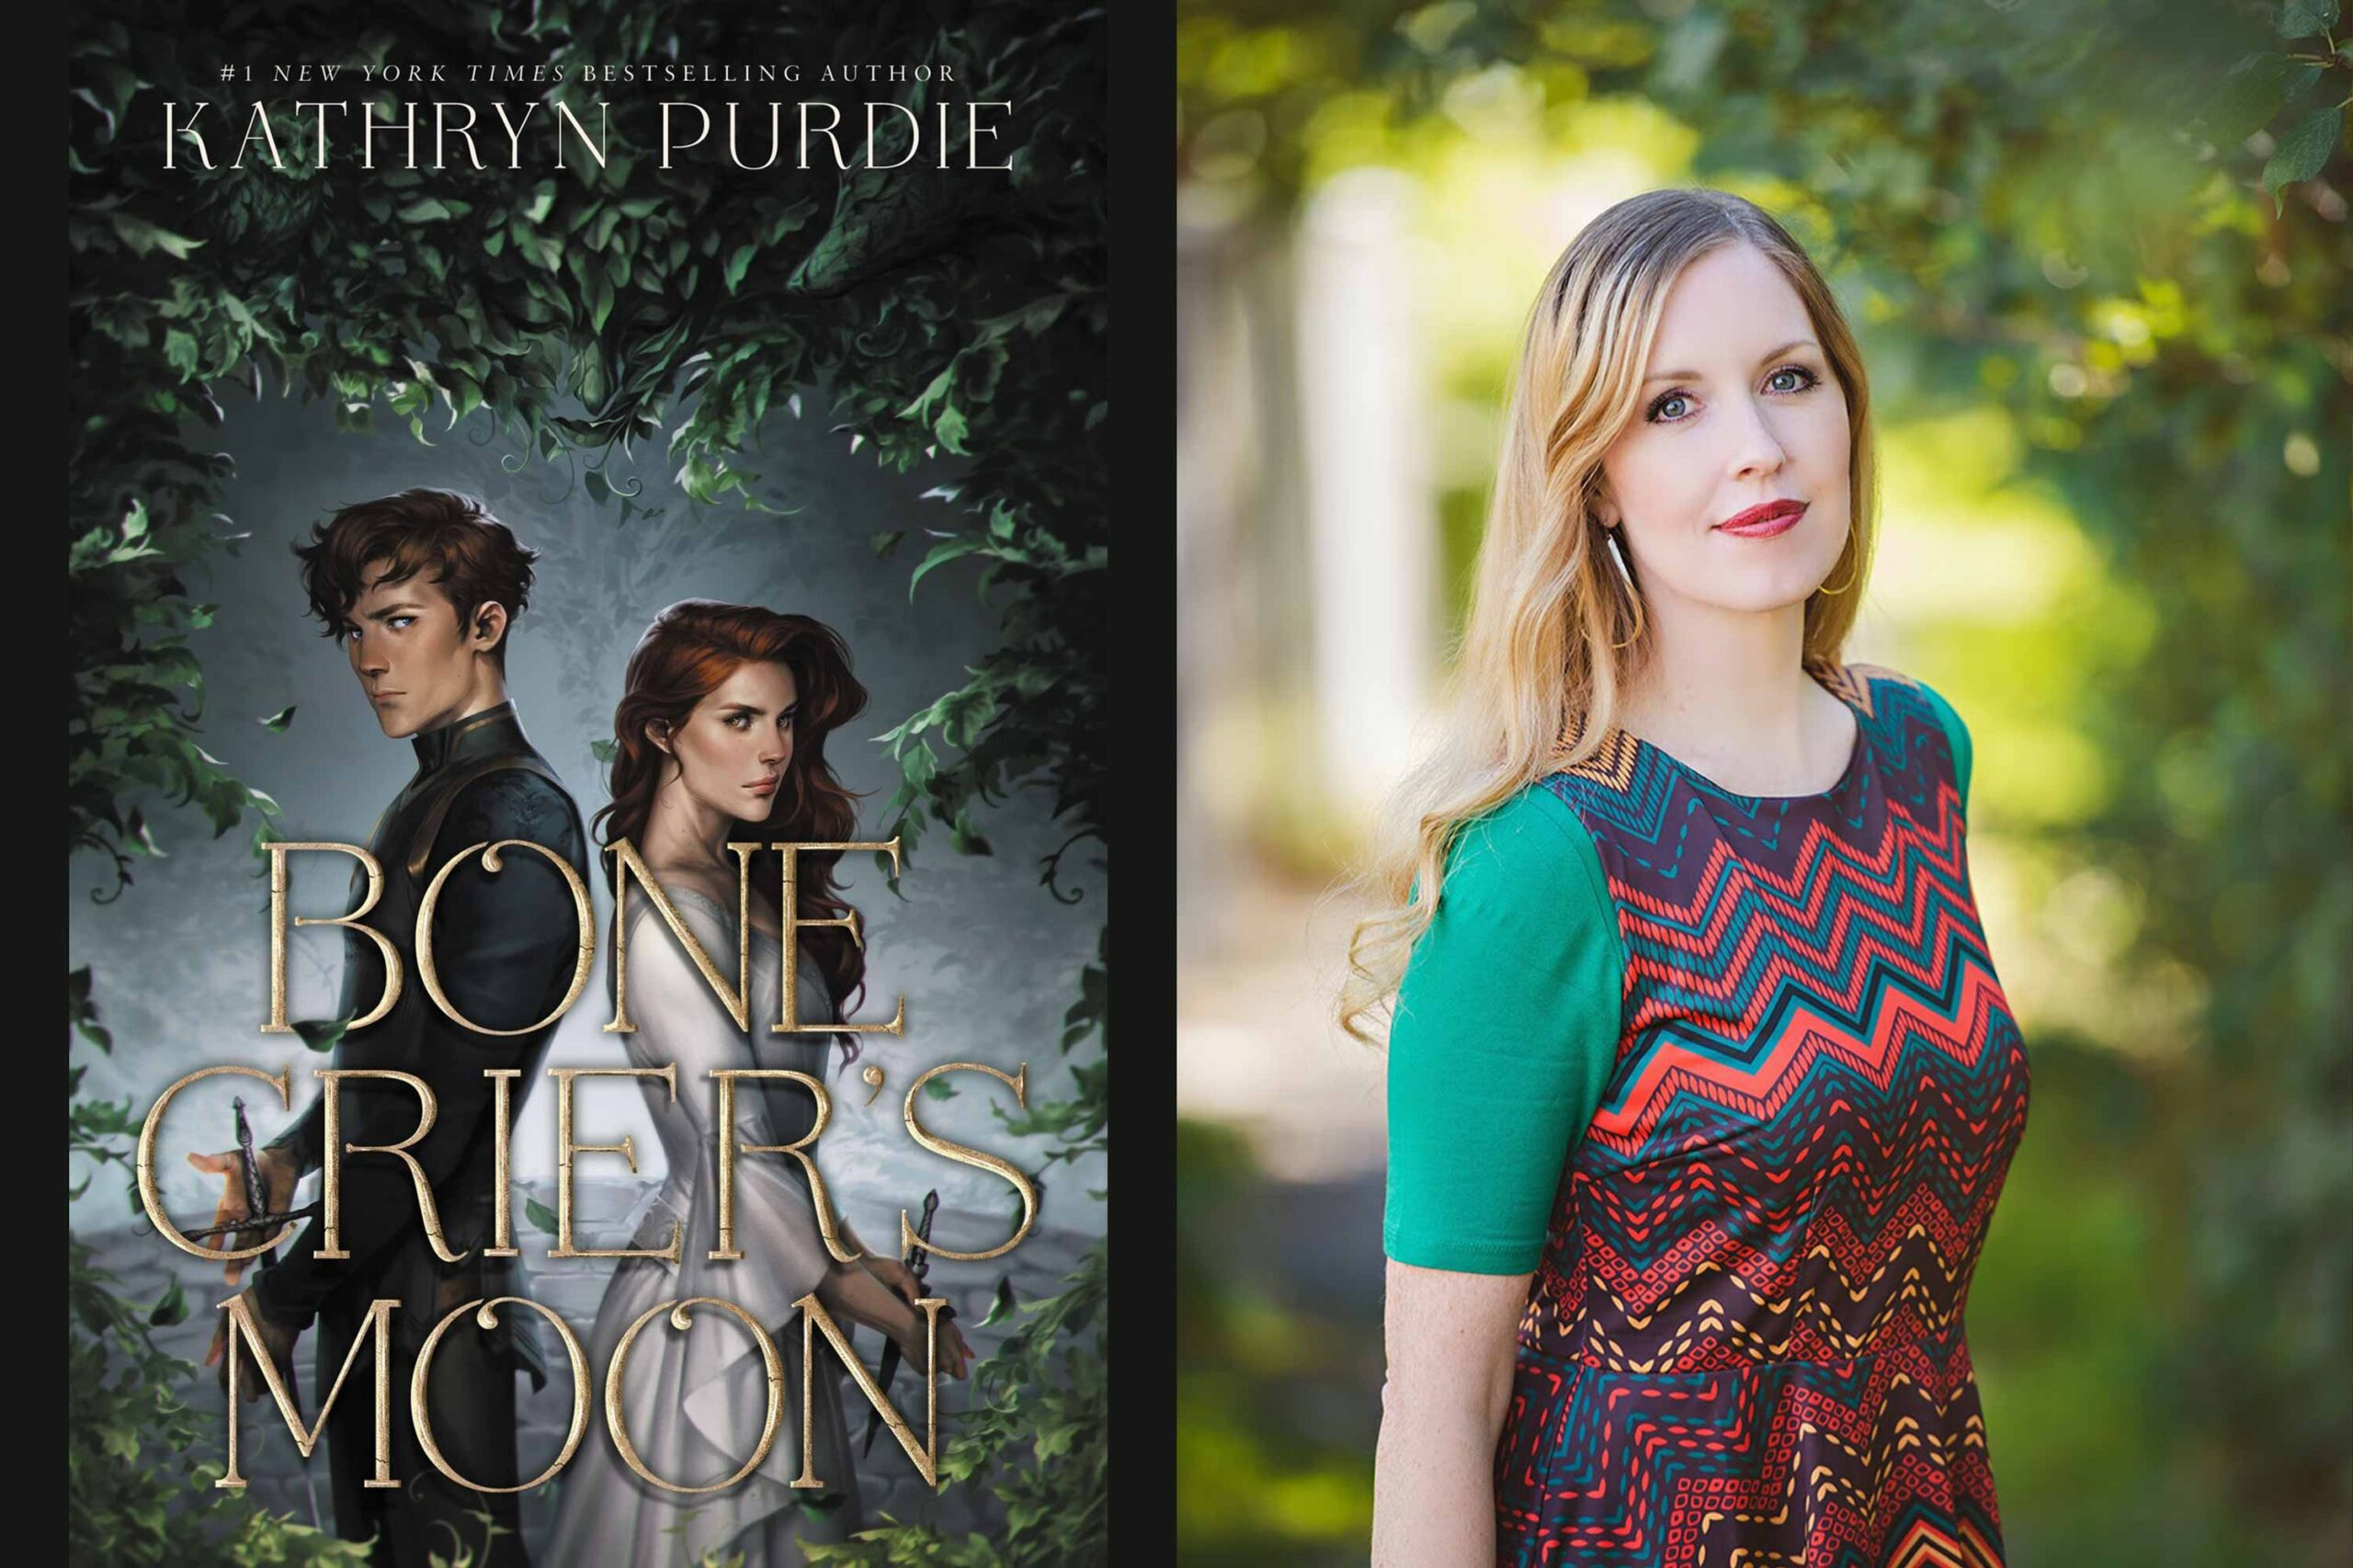 Kathryn Purdie on Bone Crier's Moon